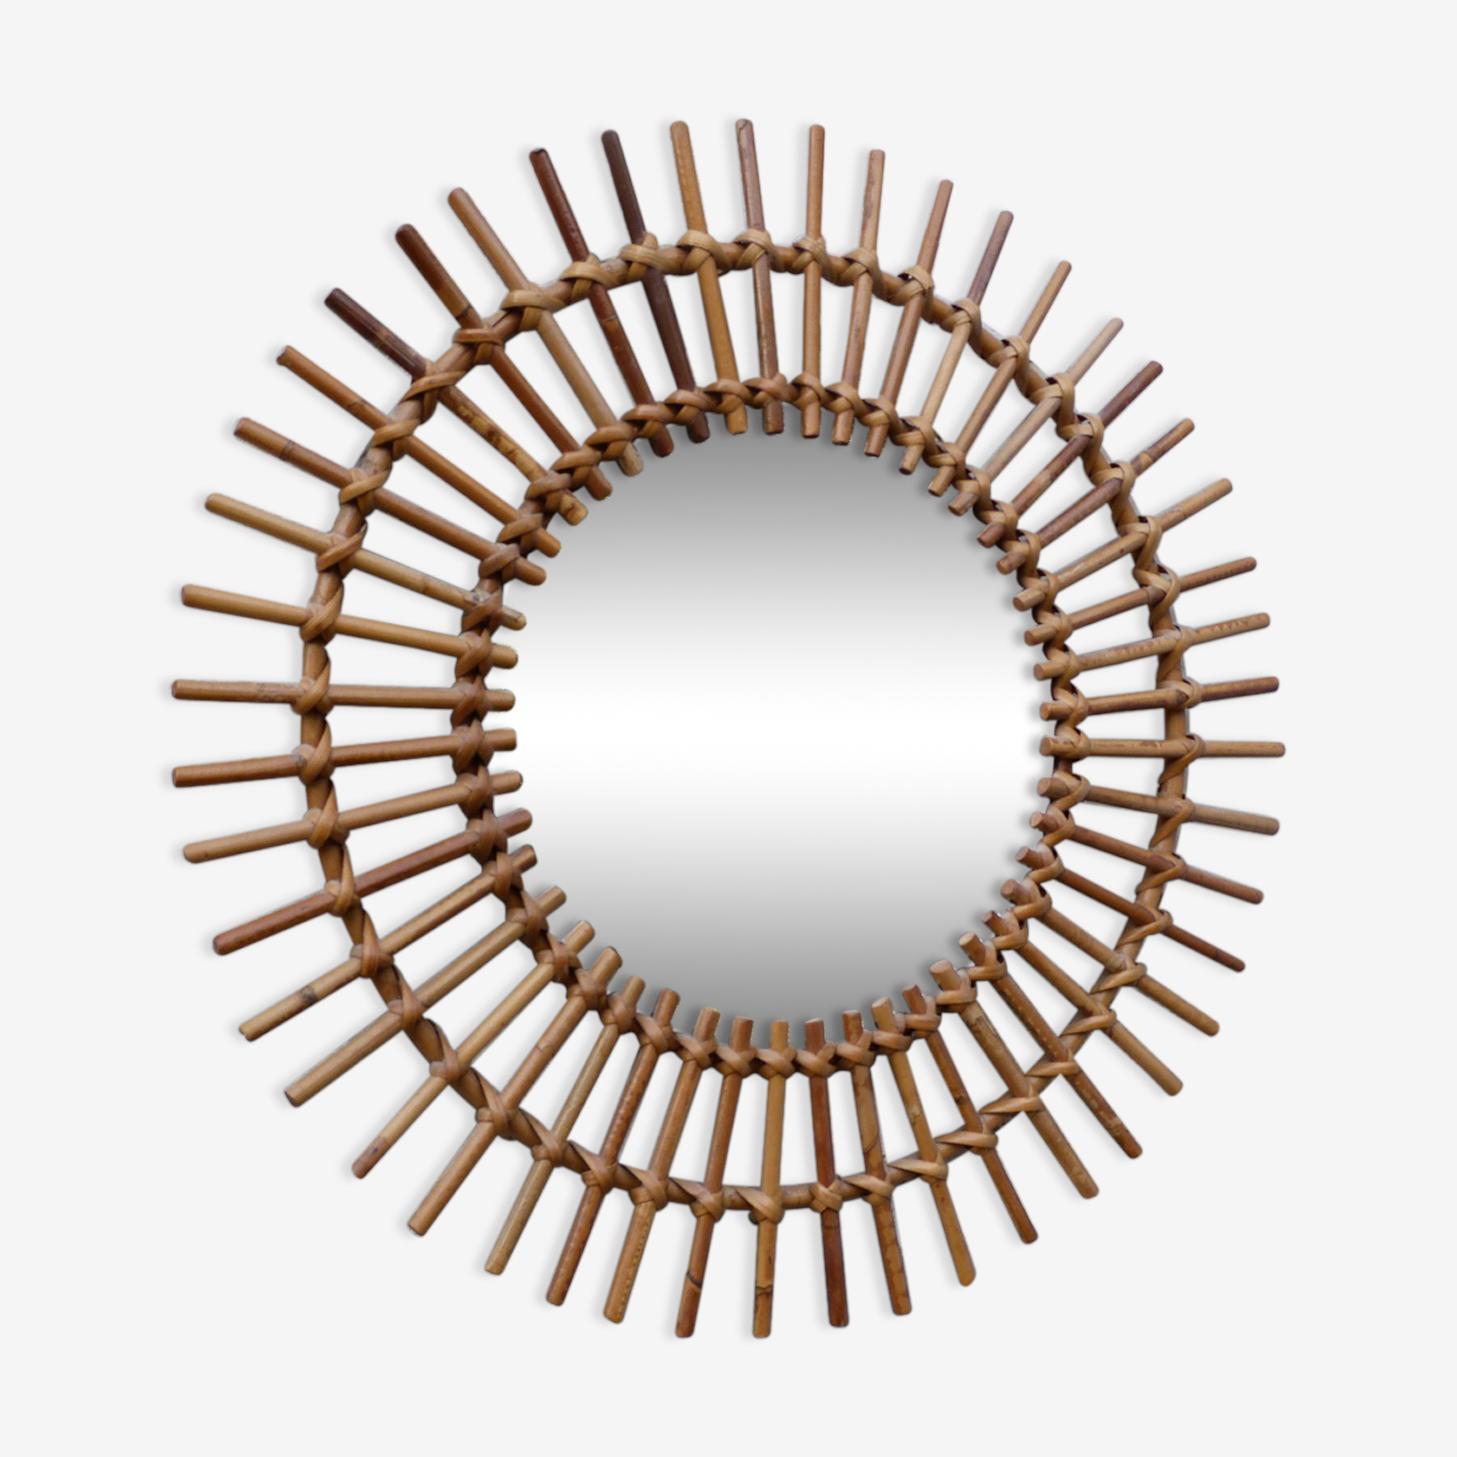 Miroir soleil rotin vintage 50-60 59cm